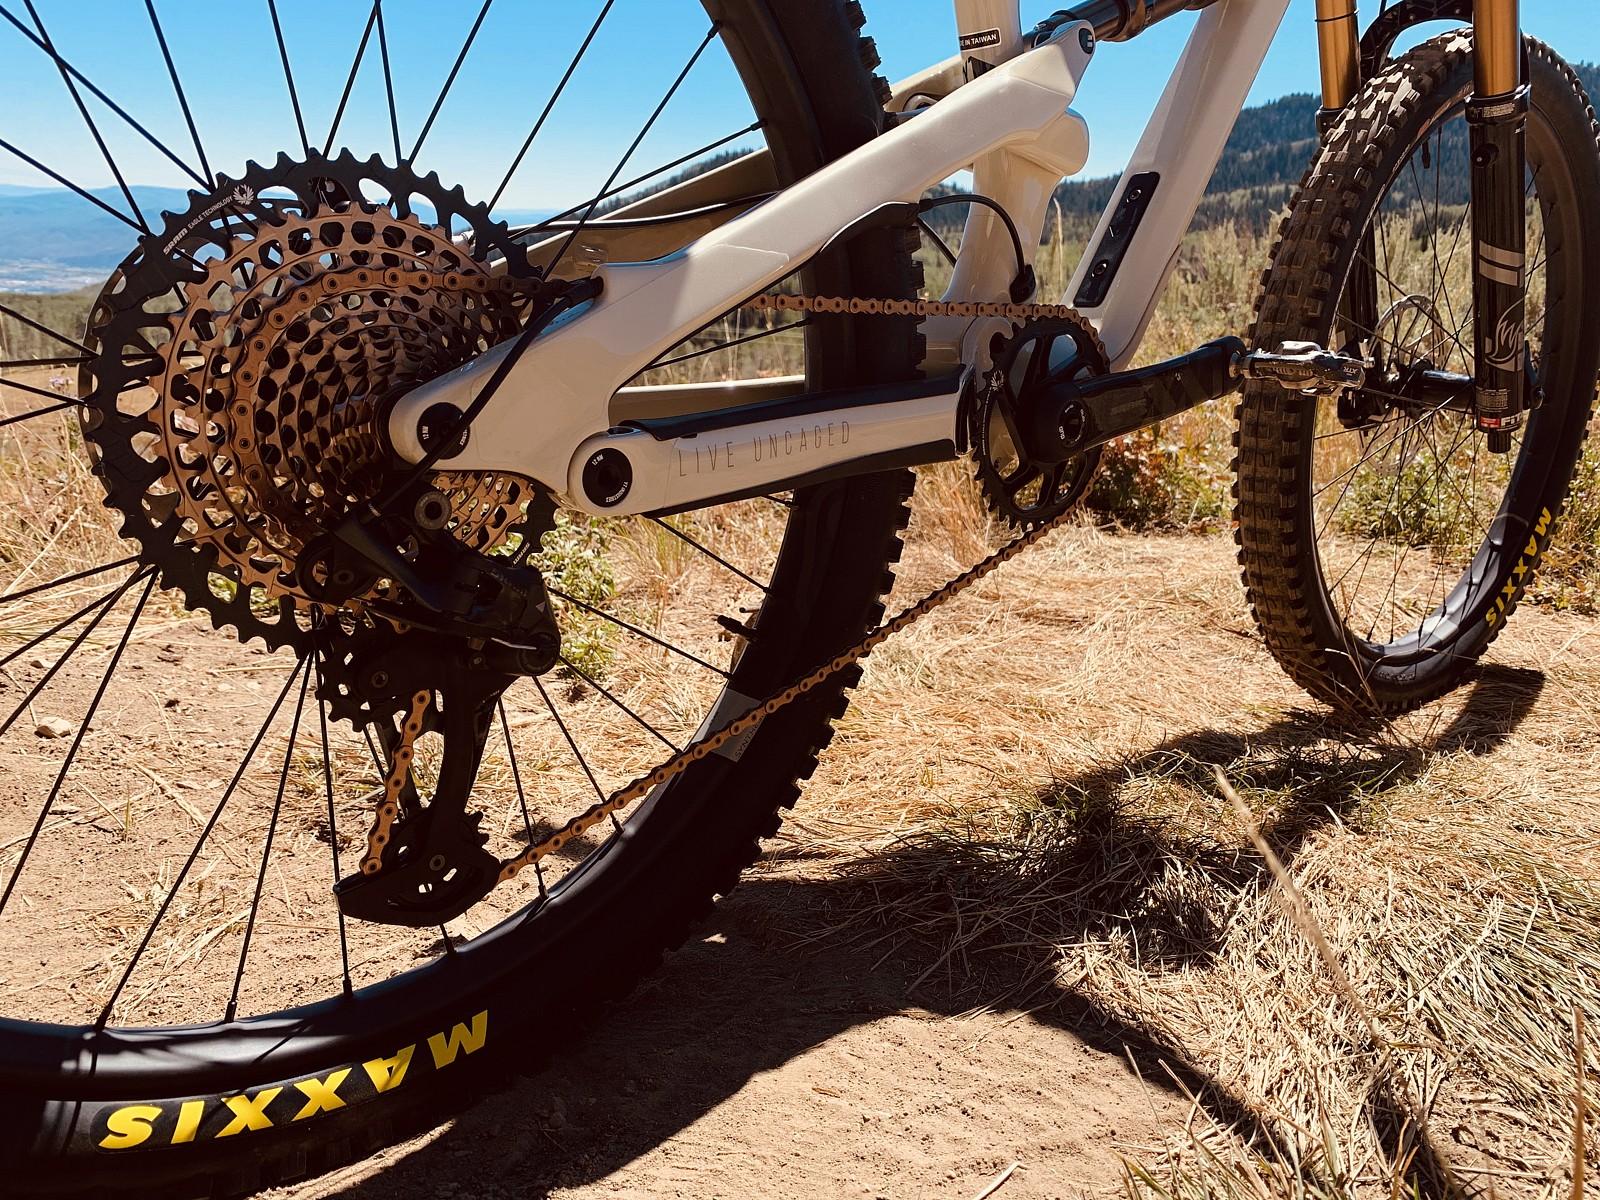 IMG E0195 - jaykalafatis - Mountain Biking Pictures - Vital MTB